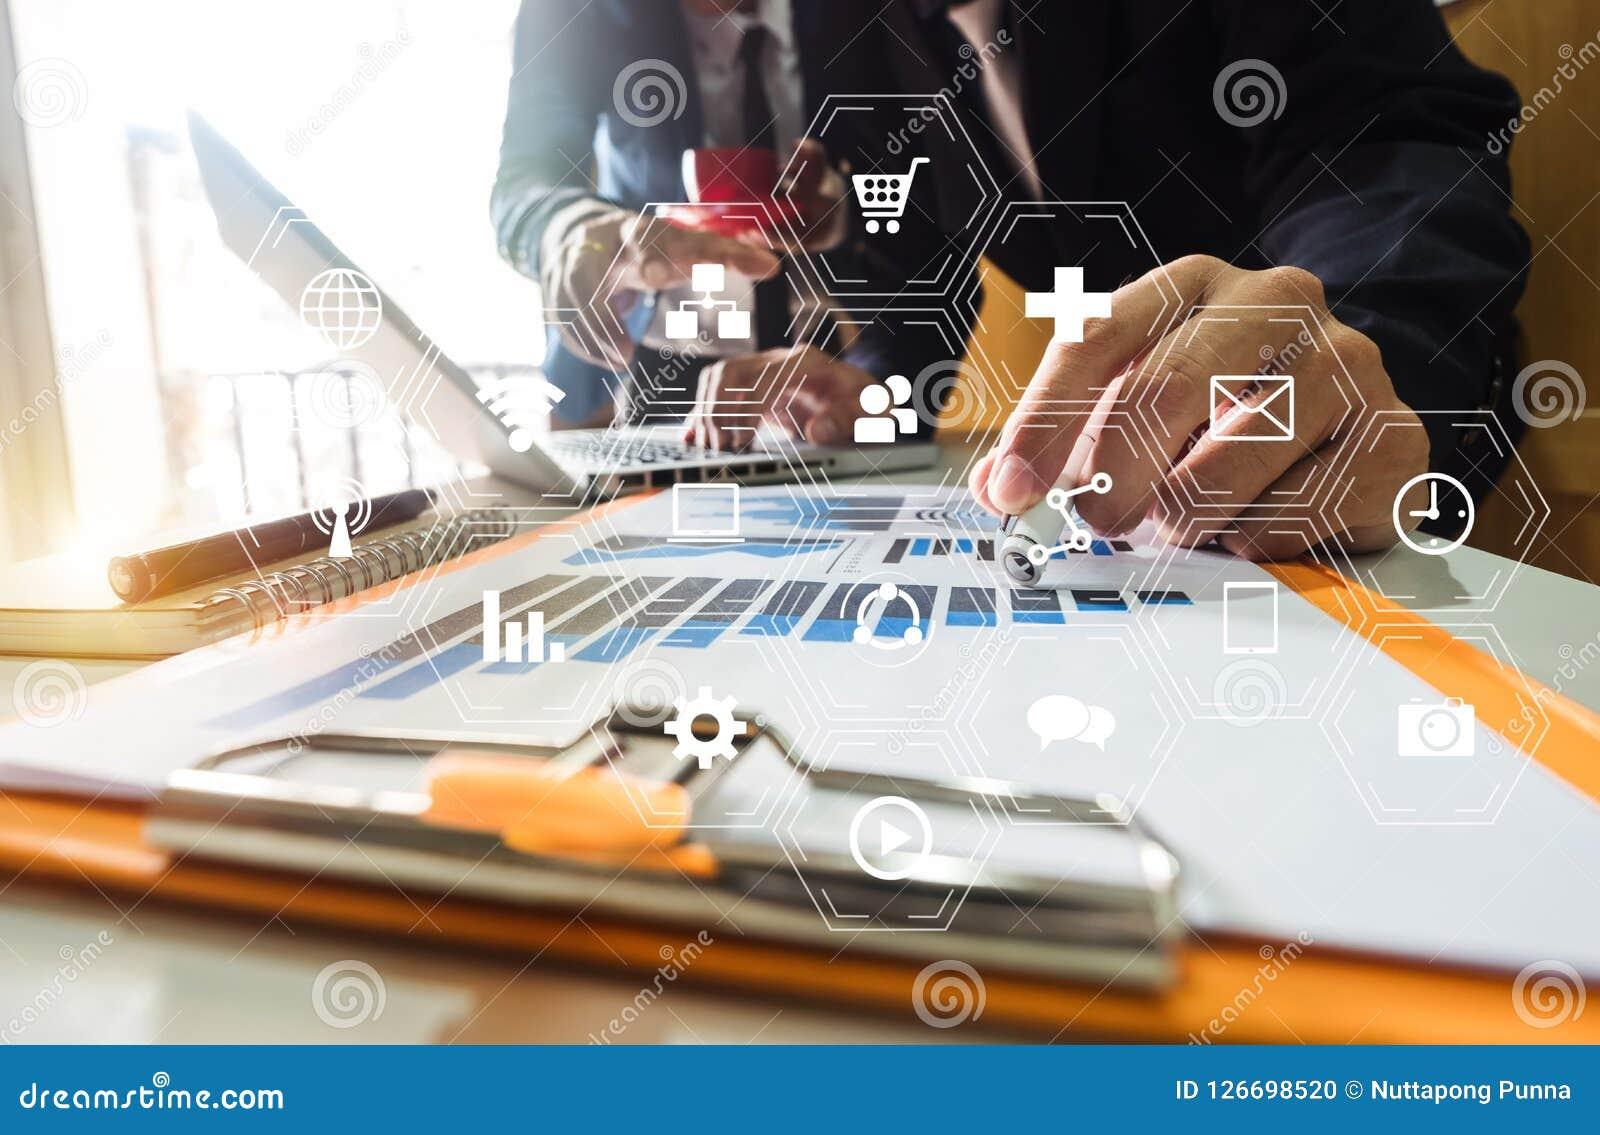 Working Team Meeting Concept, Businessman Using Smart Phone